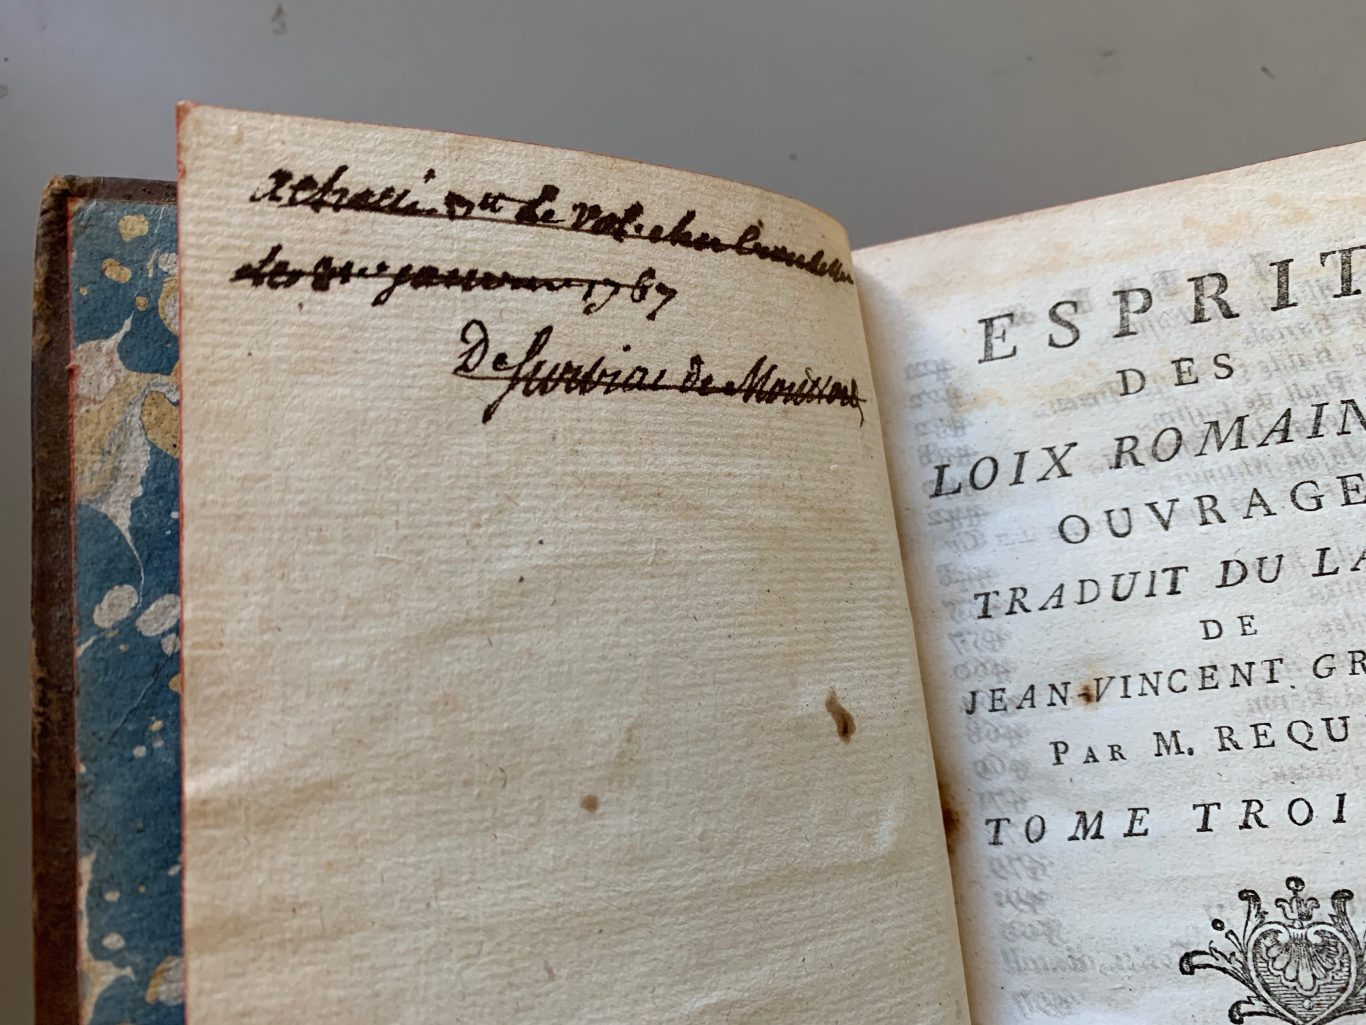 1766 - ESPRIT DES LOIX ROMAINES